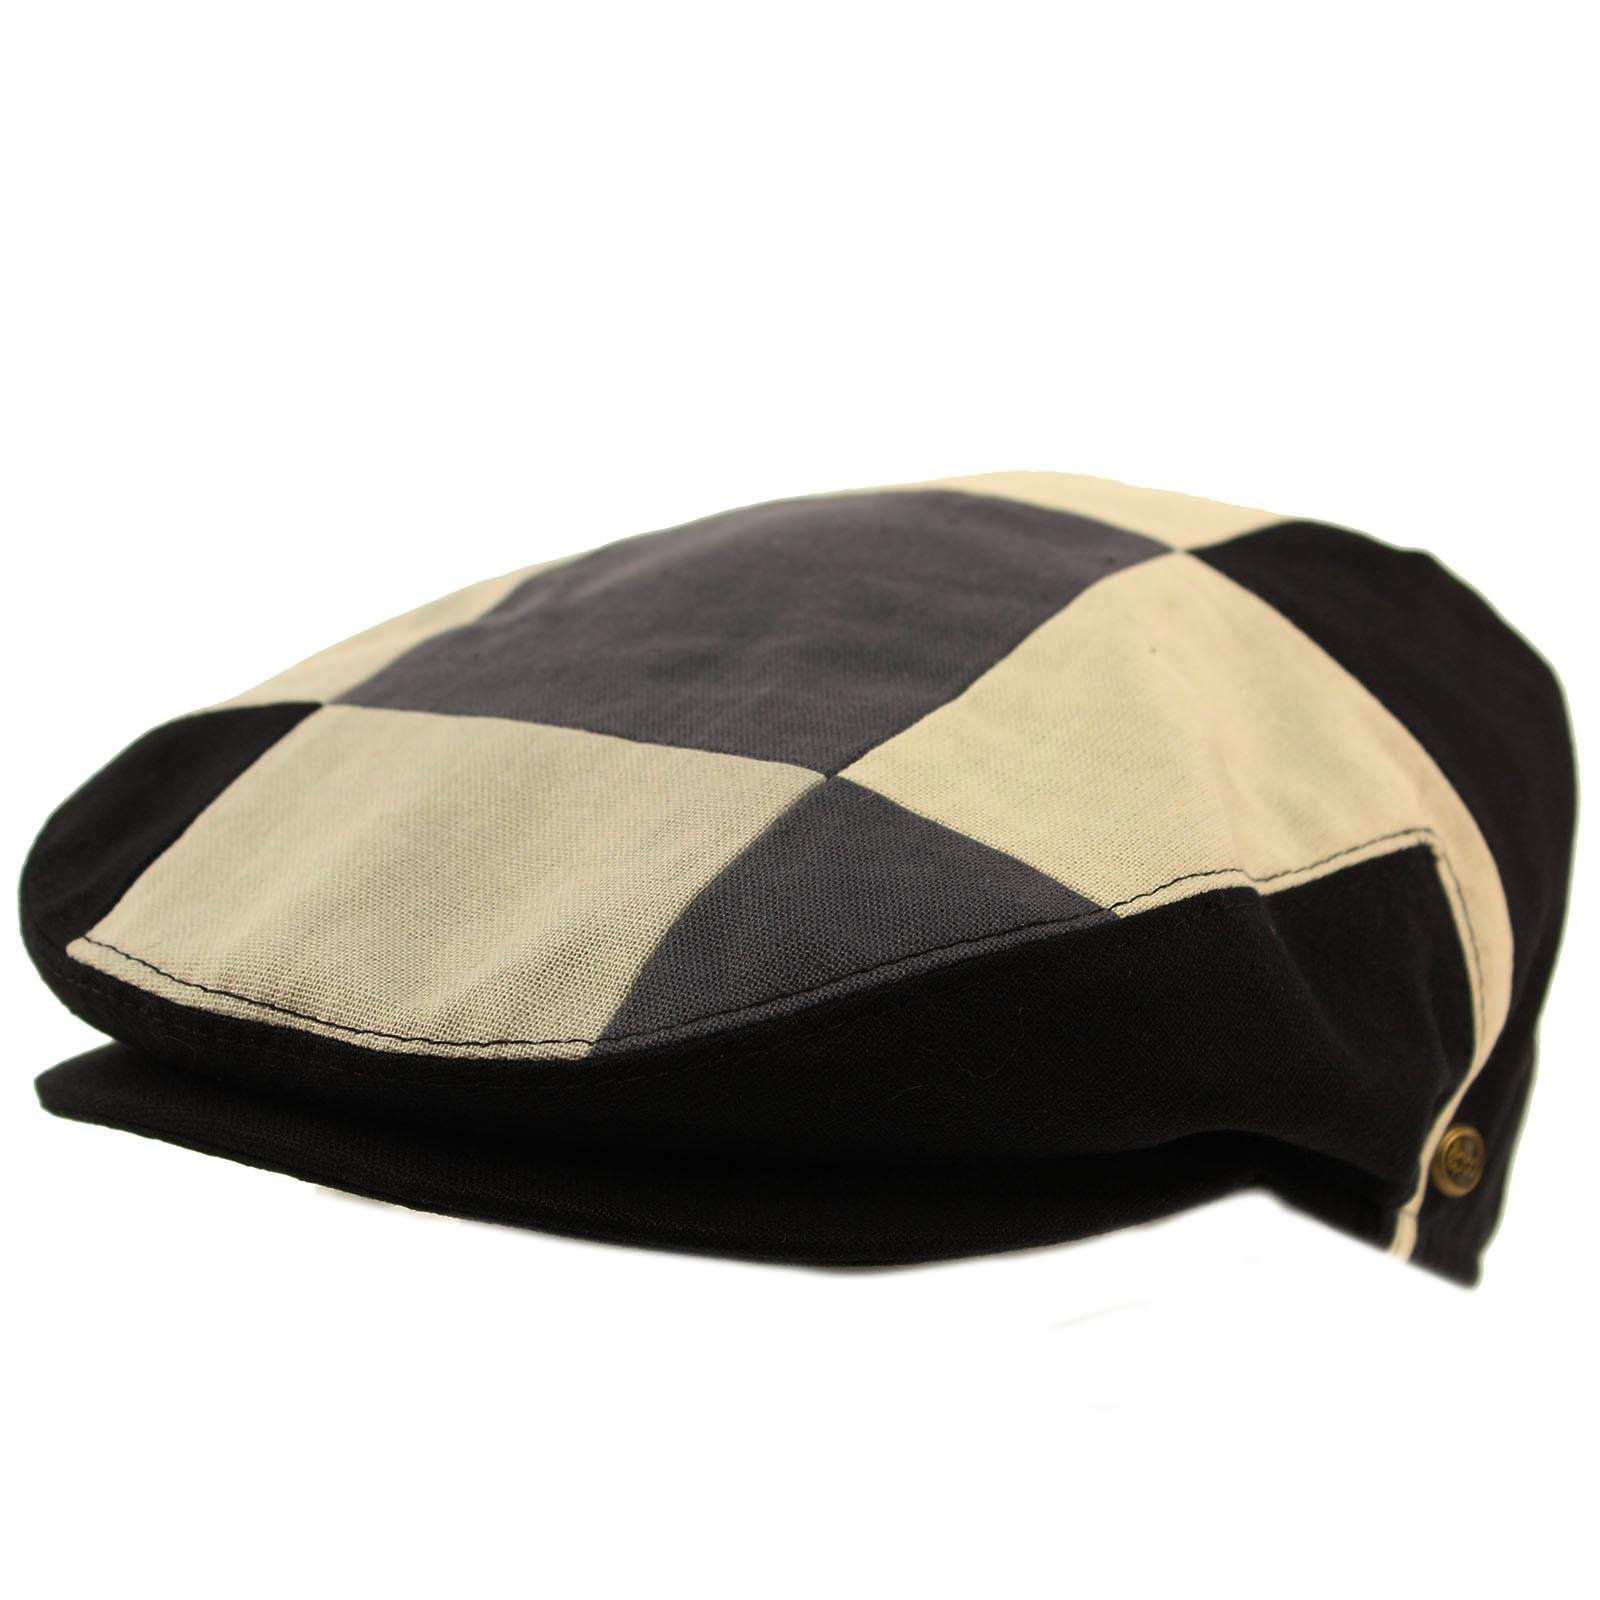 Men's Cotton 14 Panel Ivy Checkerboard Plaid Driver Cabby Flat Cap Hat Medium Black